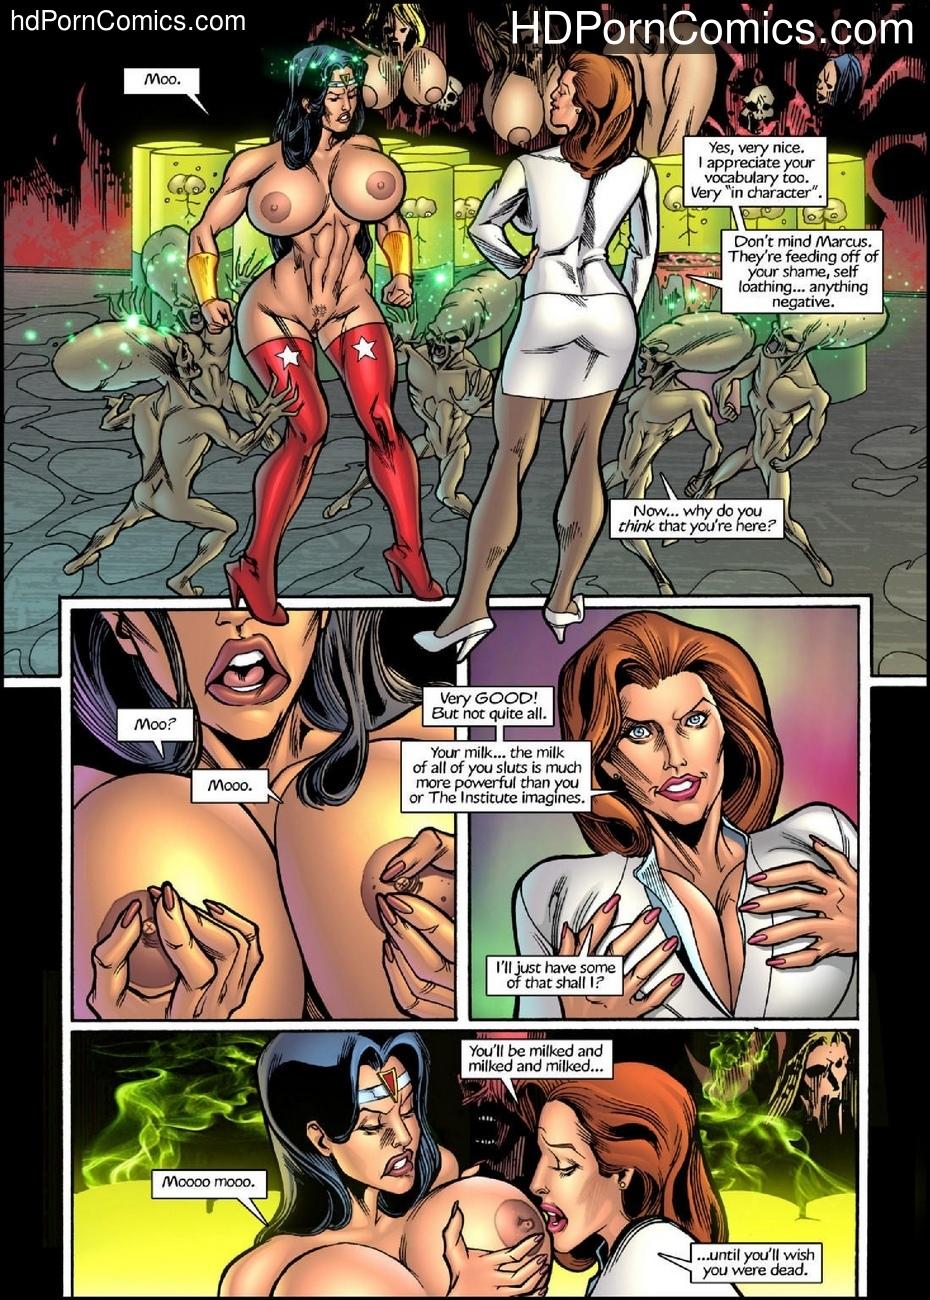 Freedom Stars - Cattle Call 1 31 free porn comics